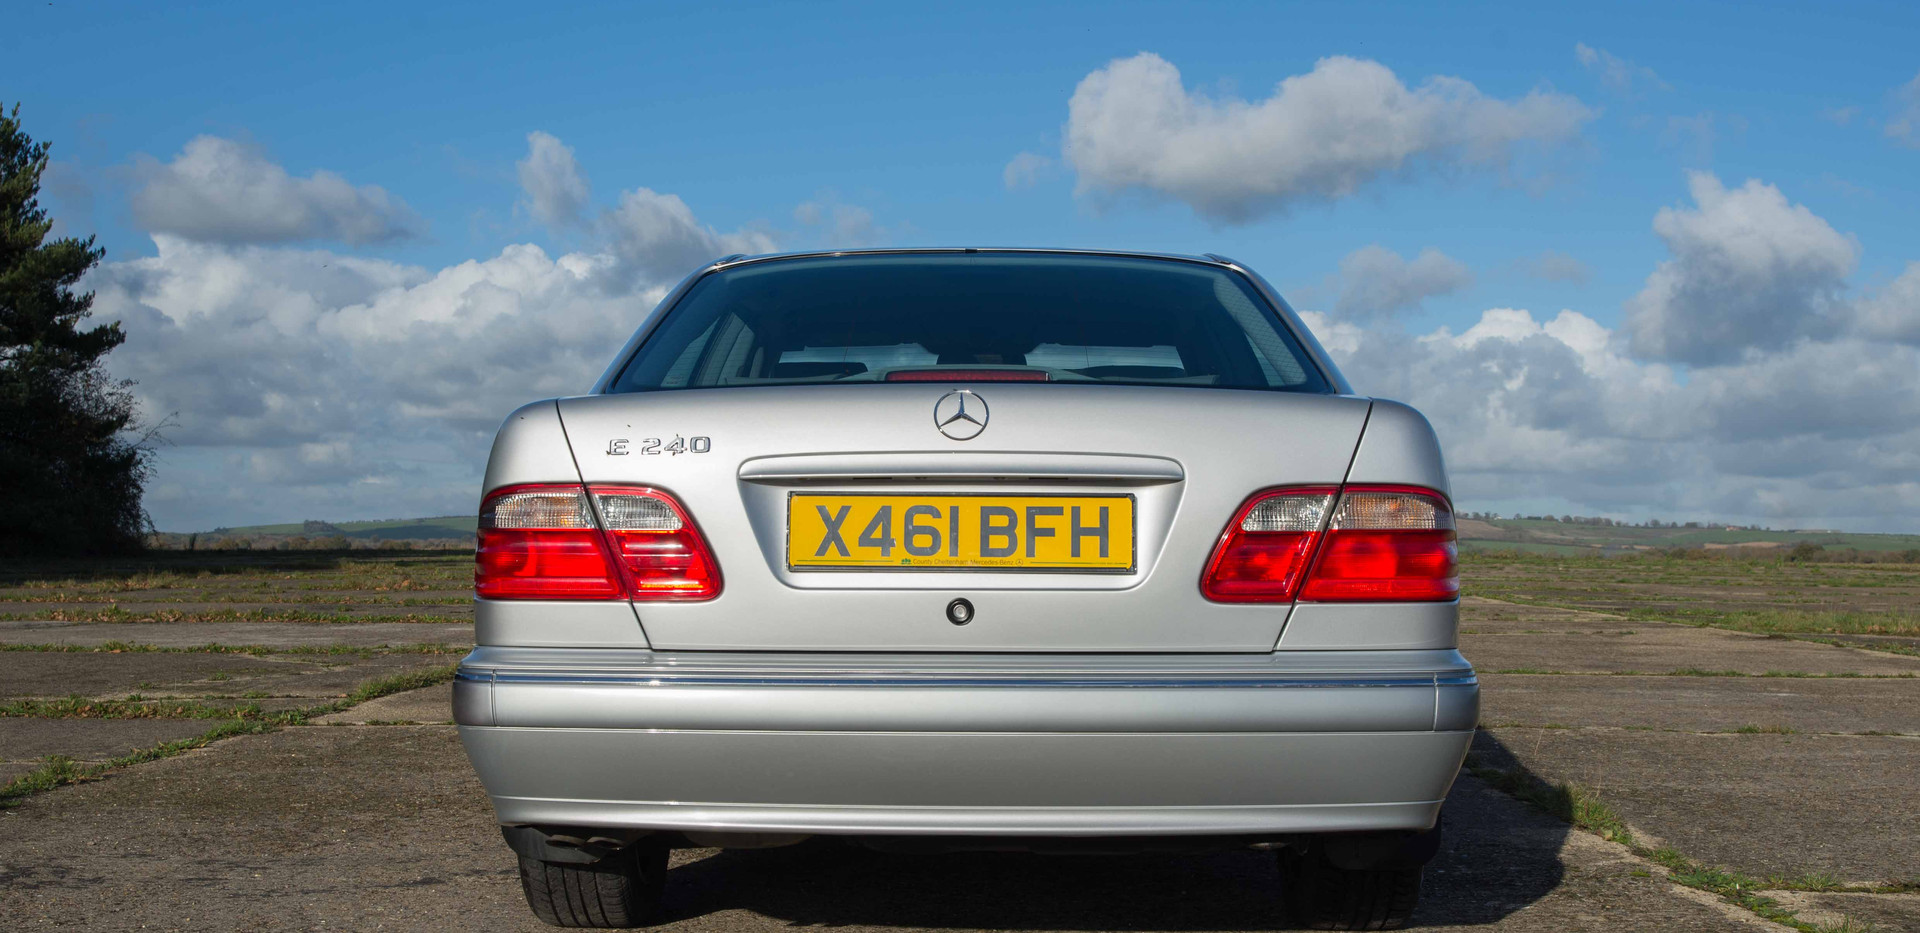 Mercedes E240 For Sale UK London  (3 of